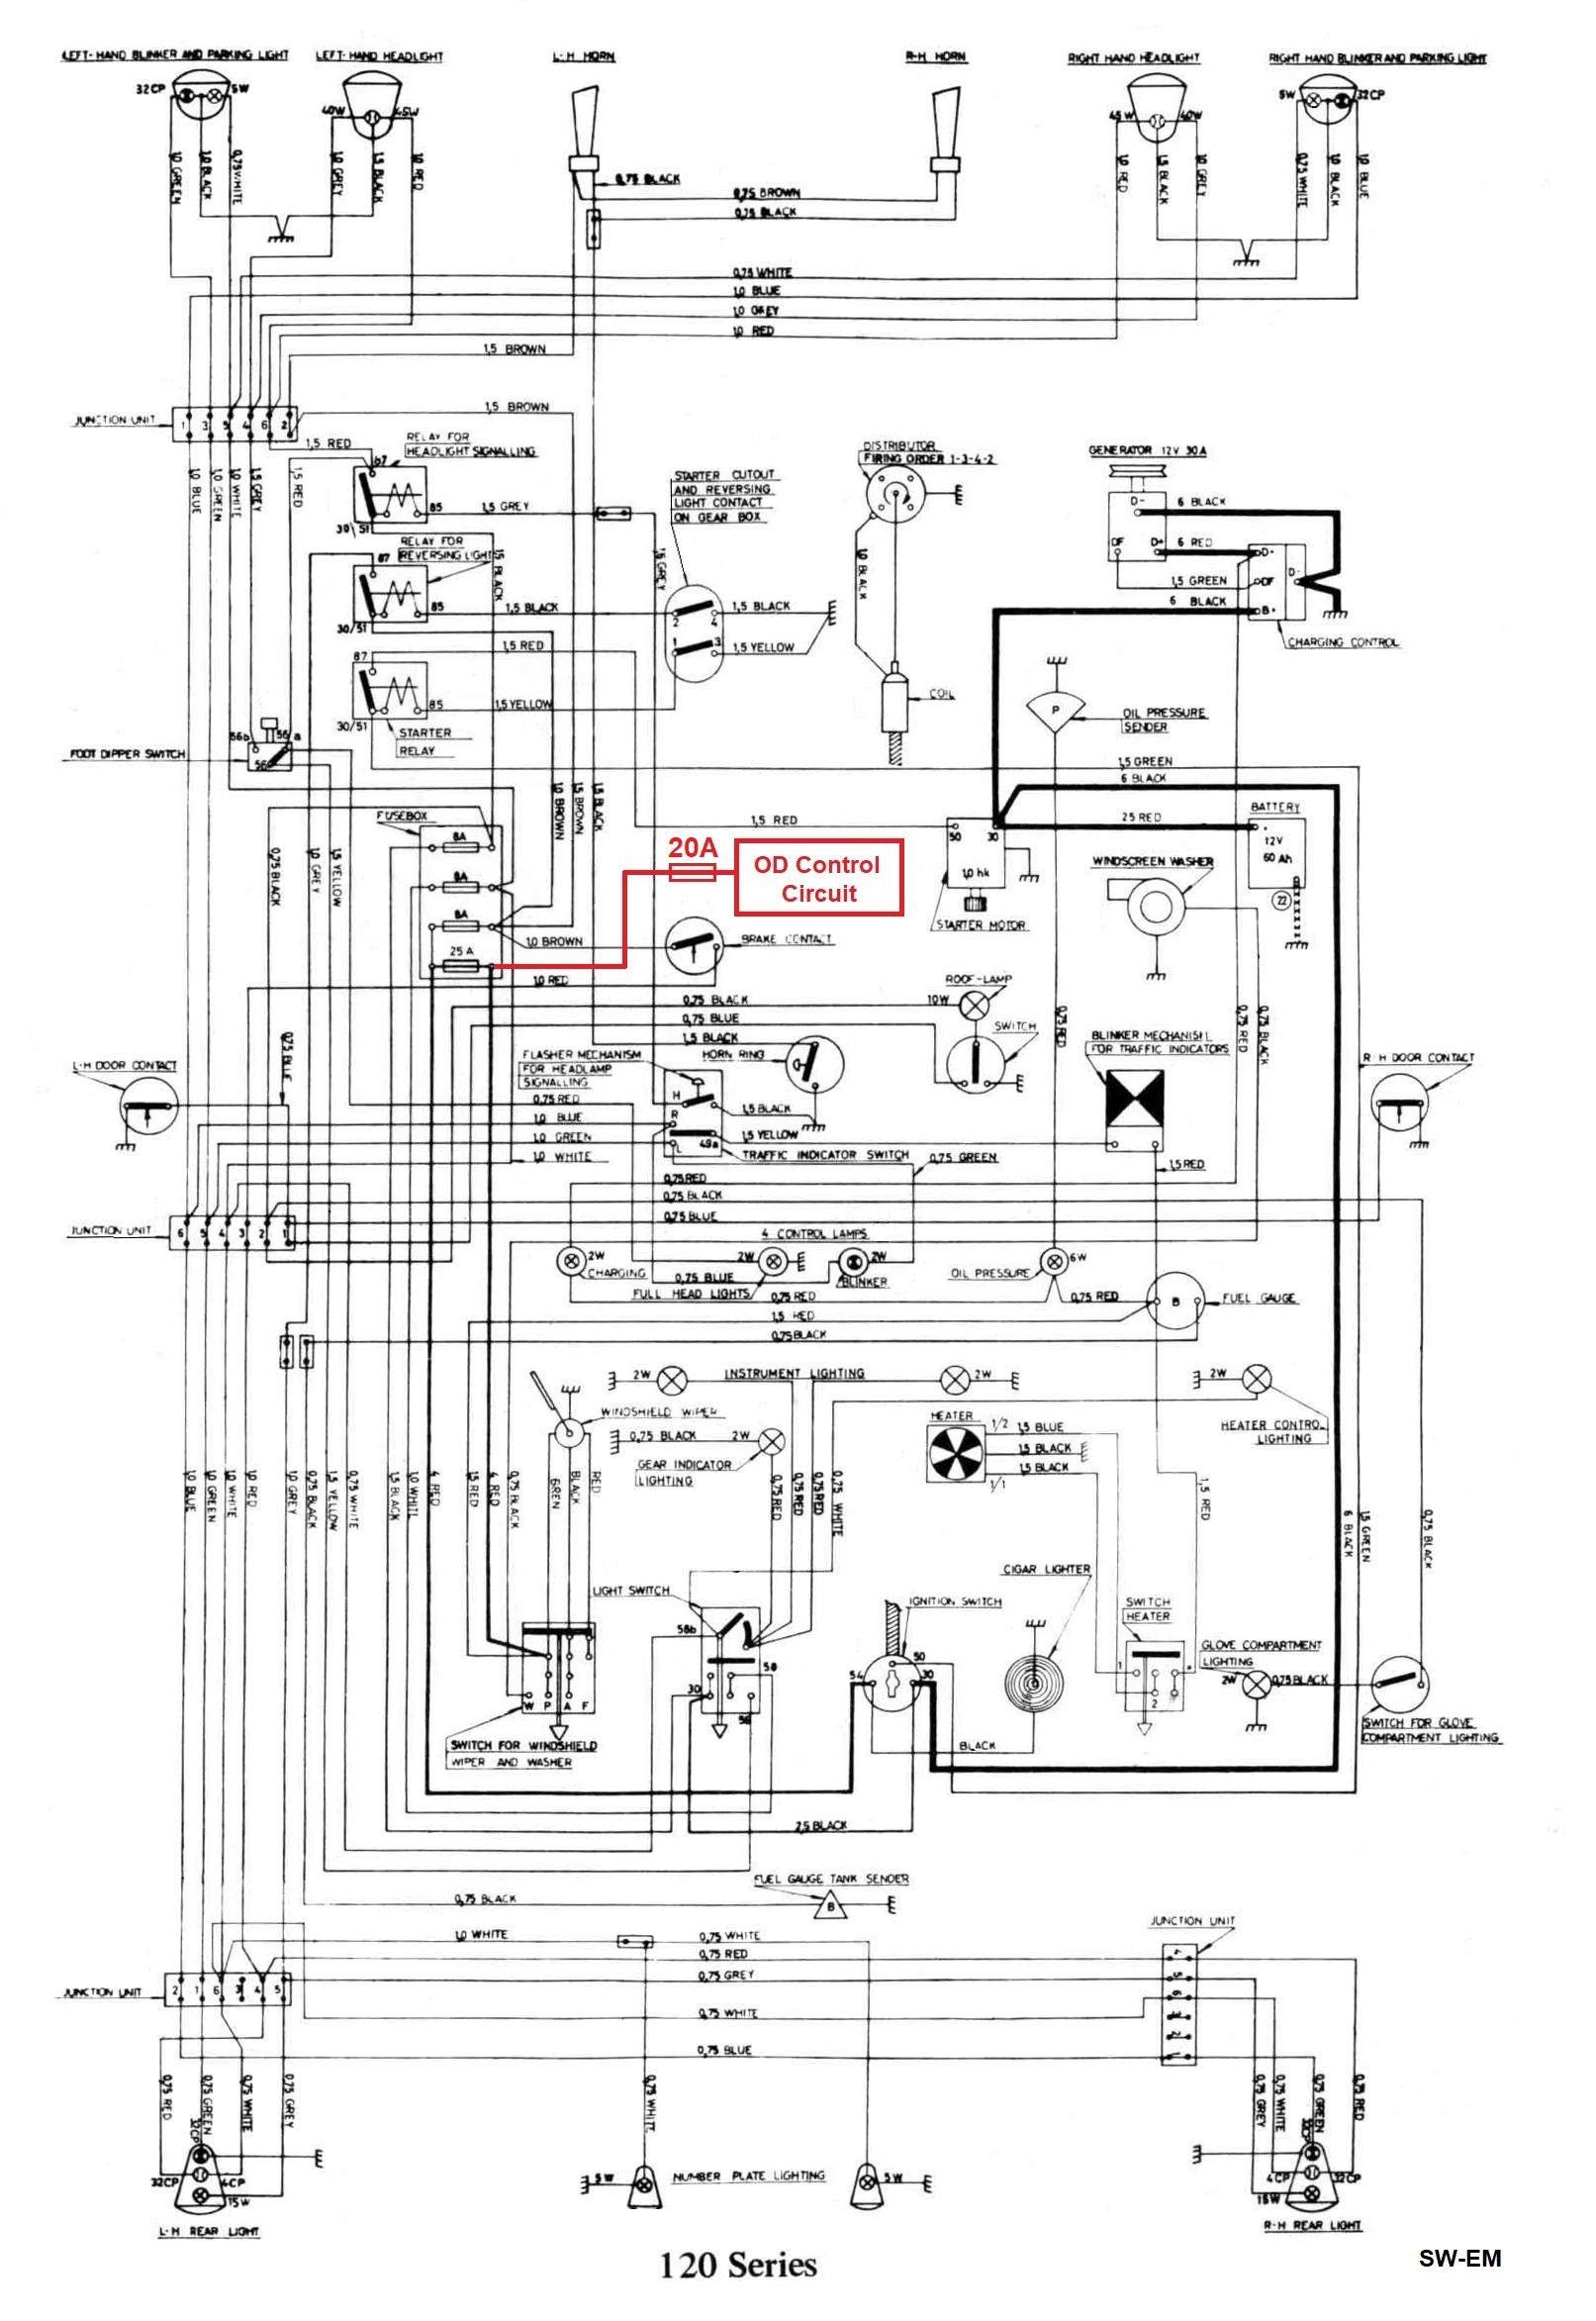 New Wiring Diagram Car Relay Diagram Wire Switch